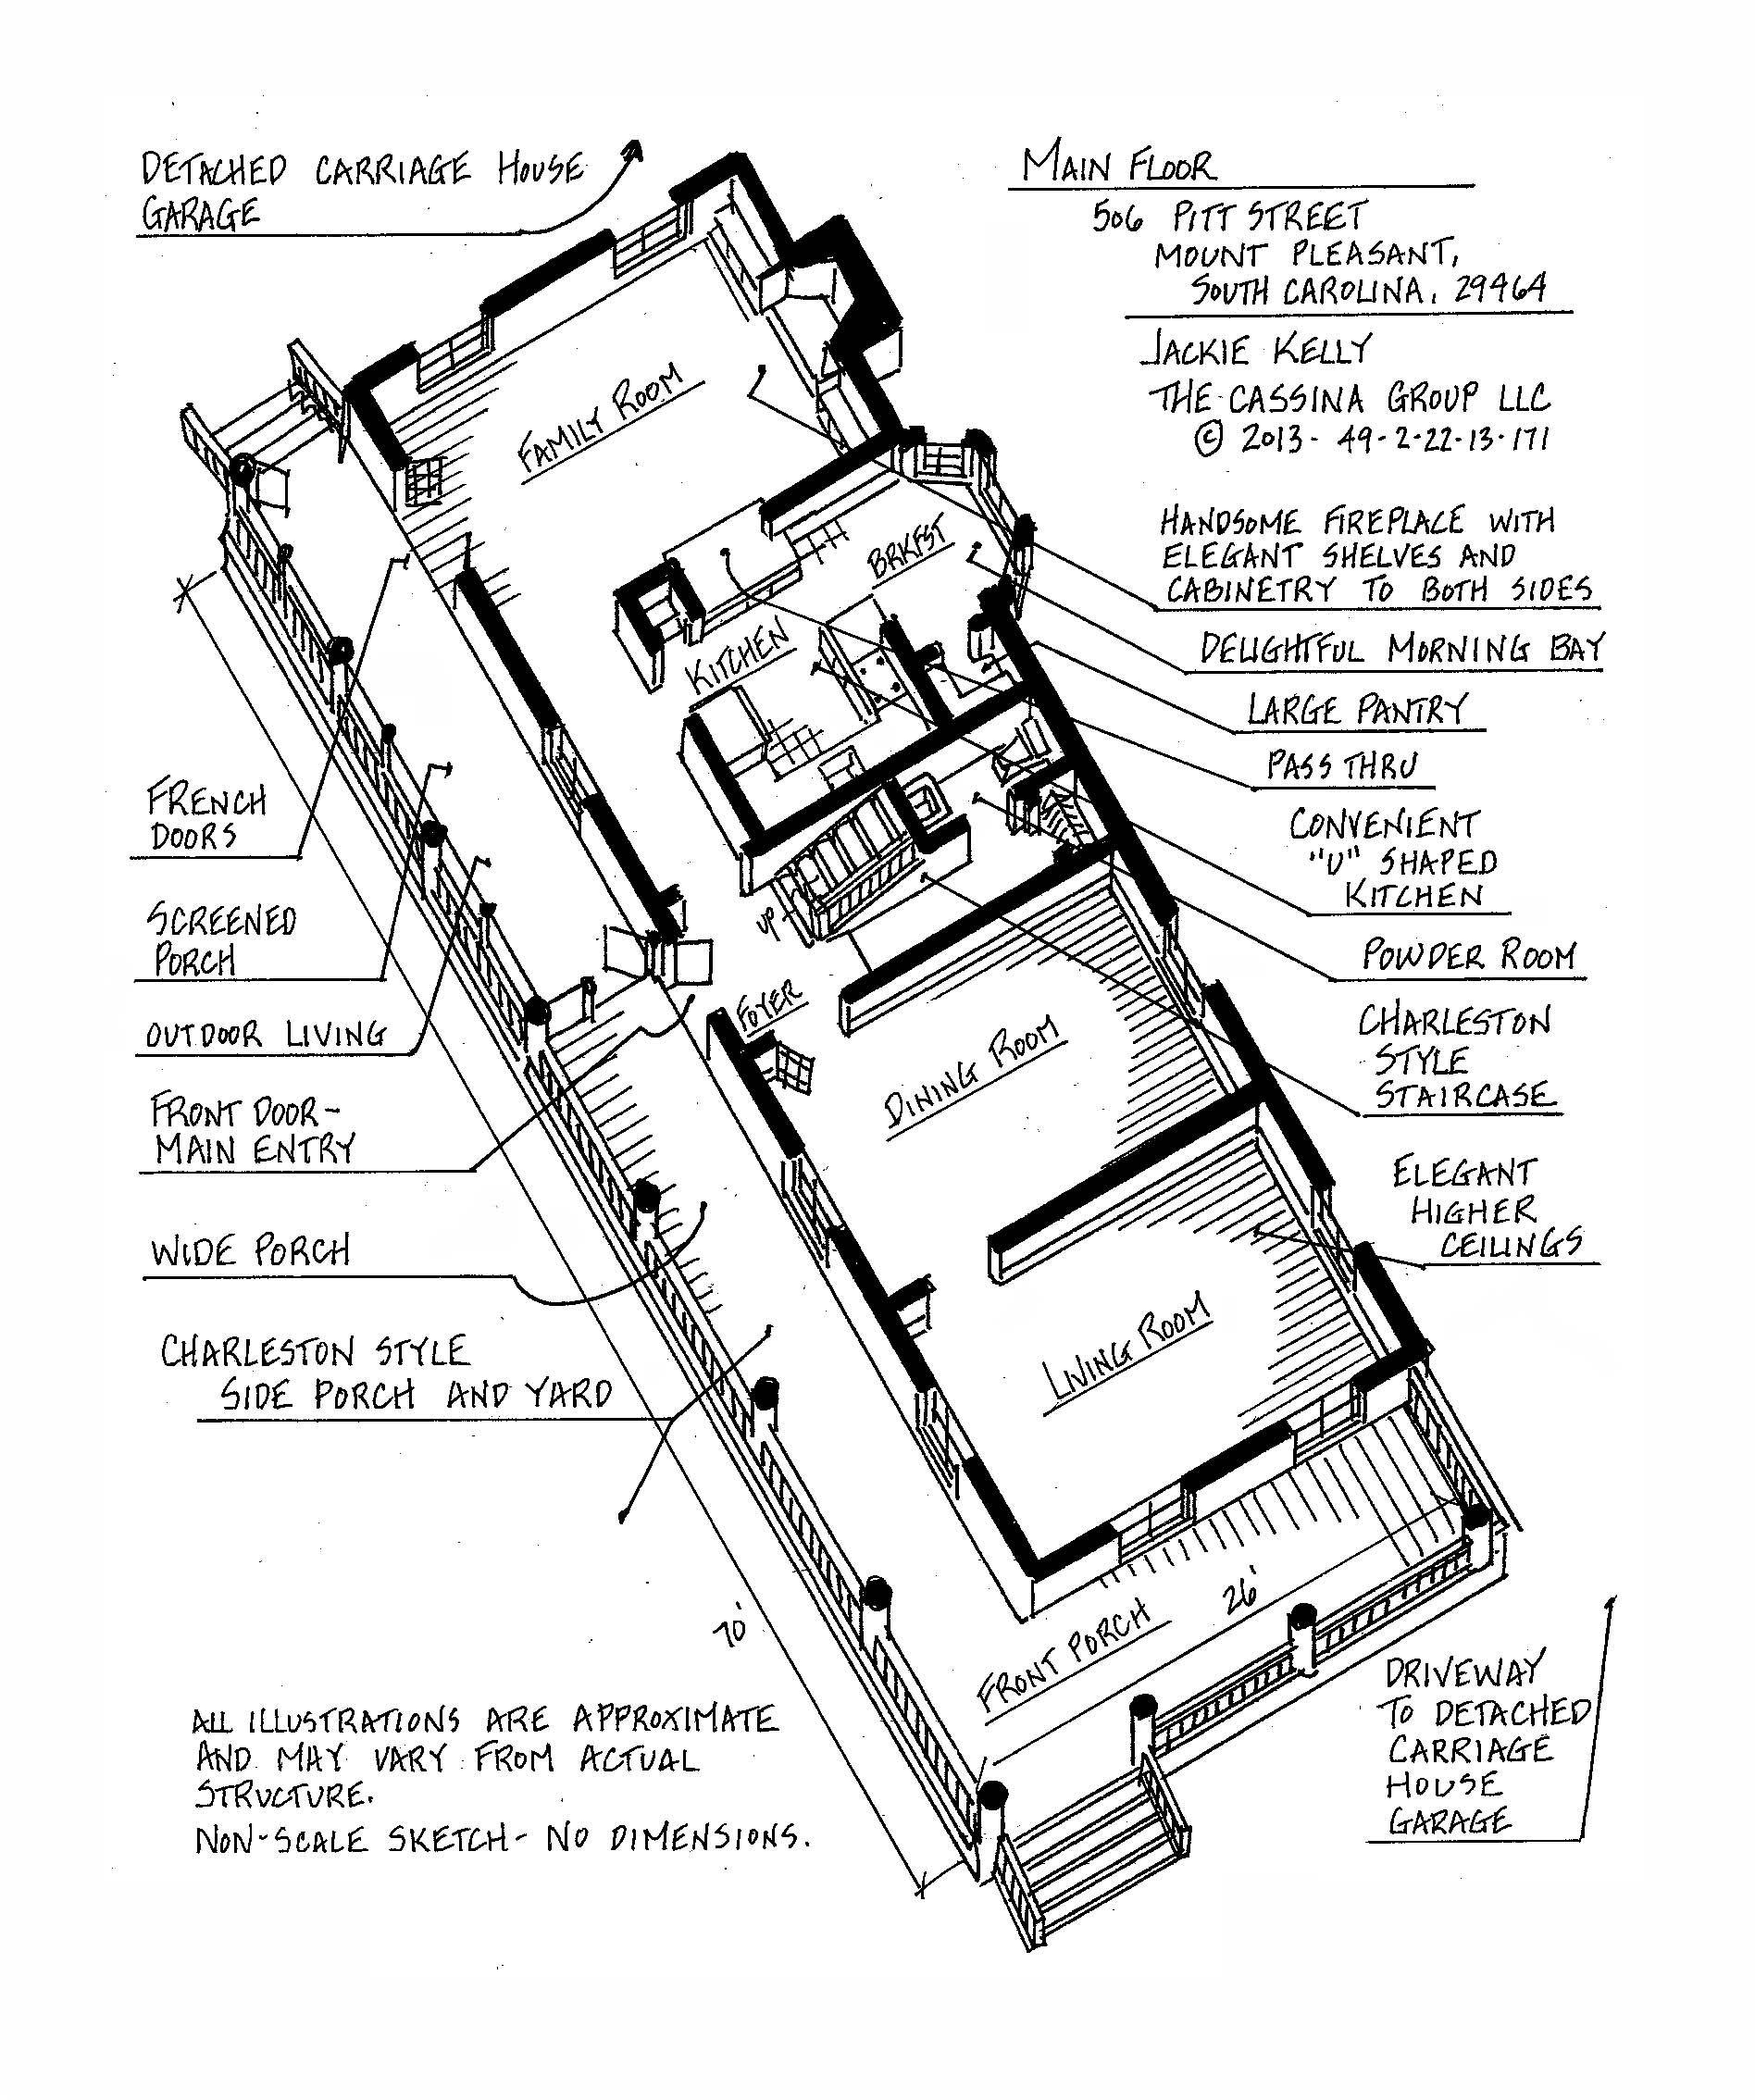 506 Pitt Street Floor Plans